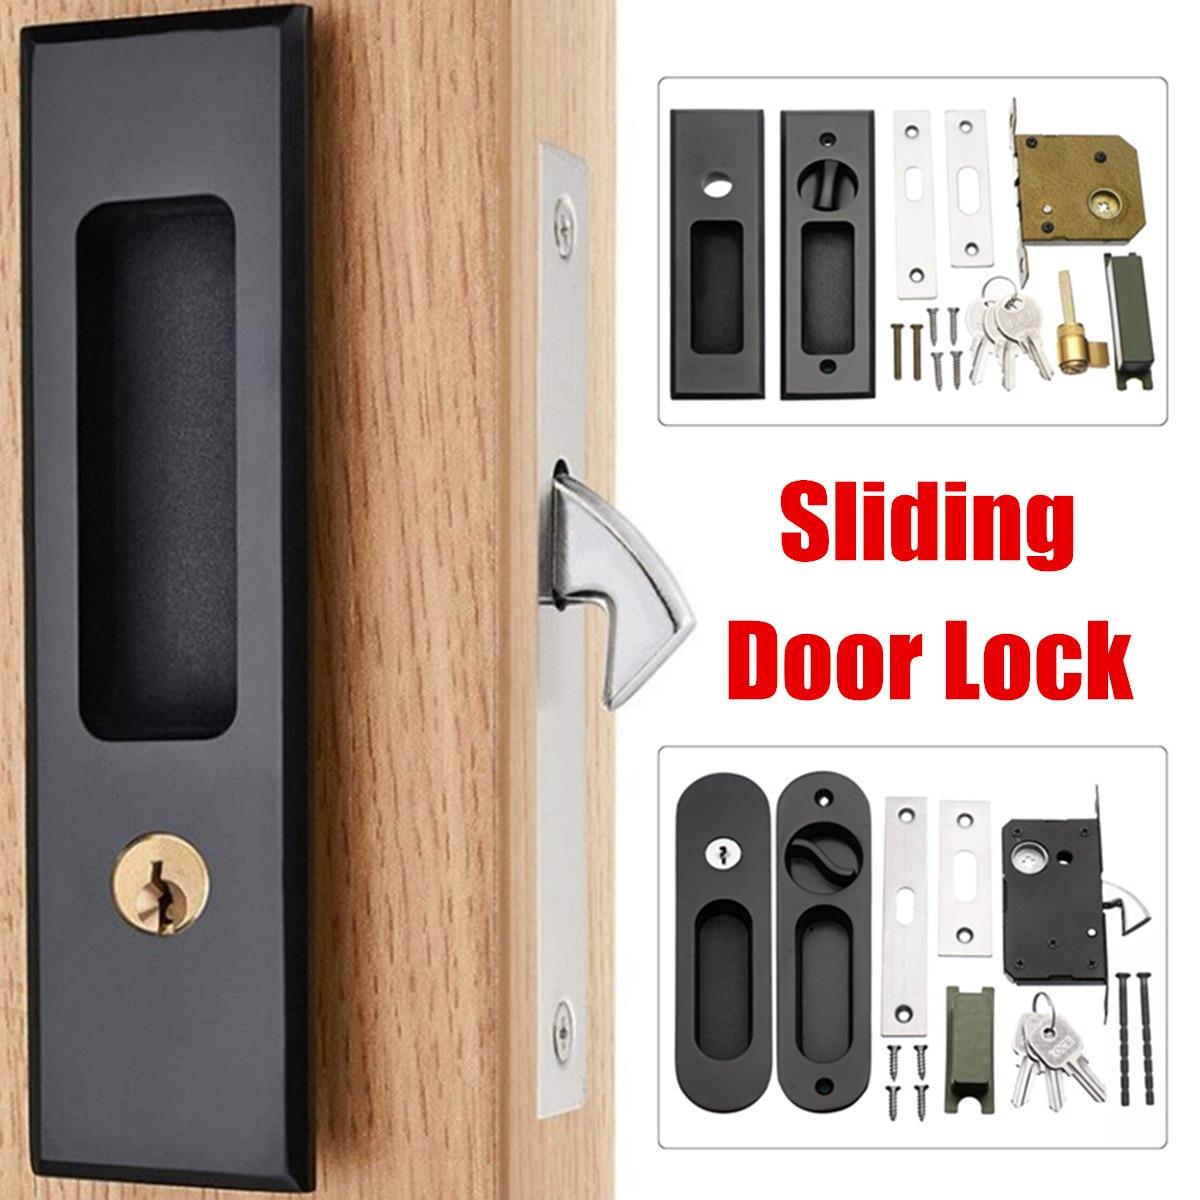 Clearance Sale Lock Hardware Accessory Furniture Black Handle Sliding Door Wood Anti Theft Room Matt